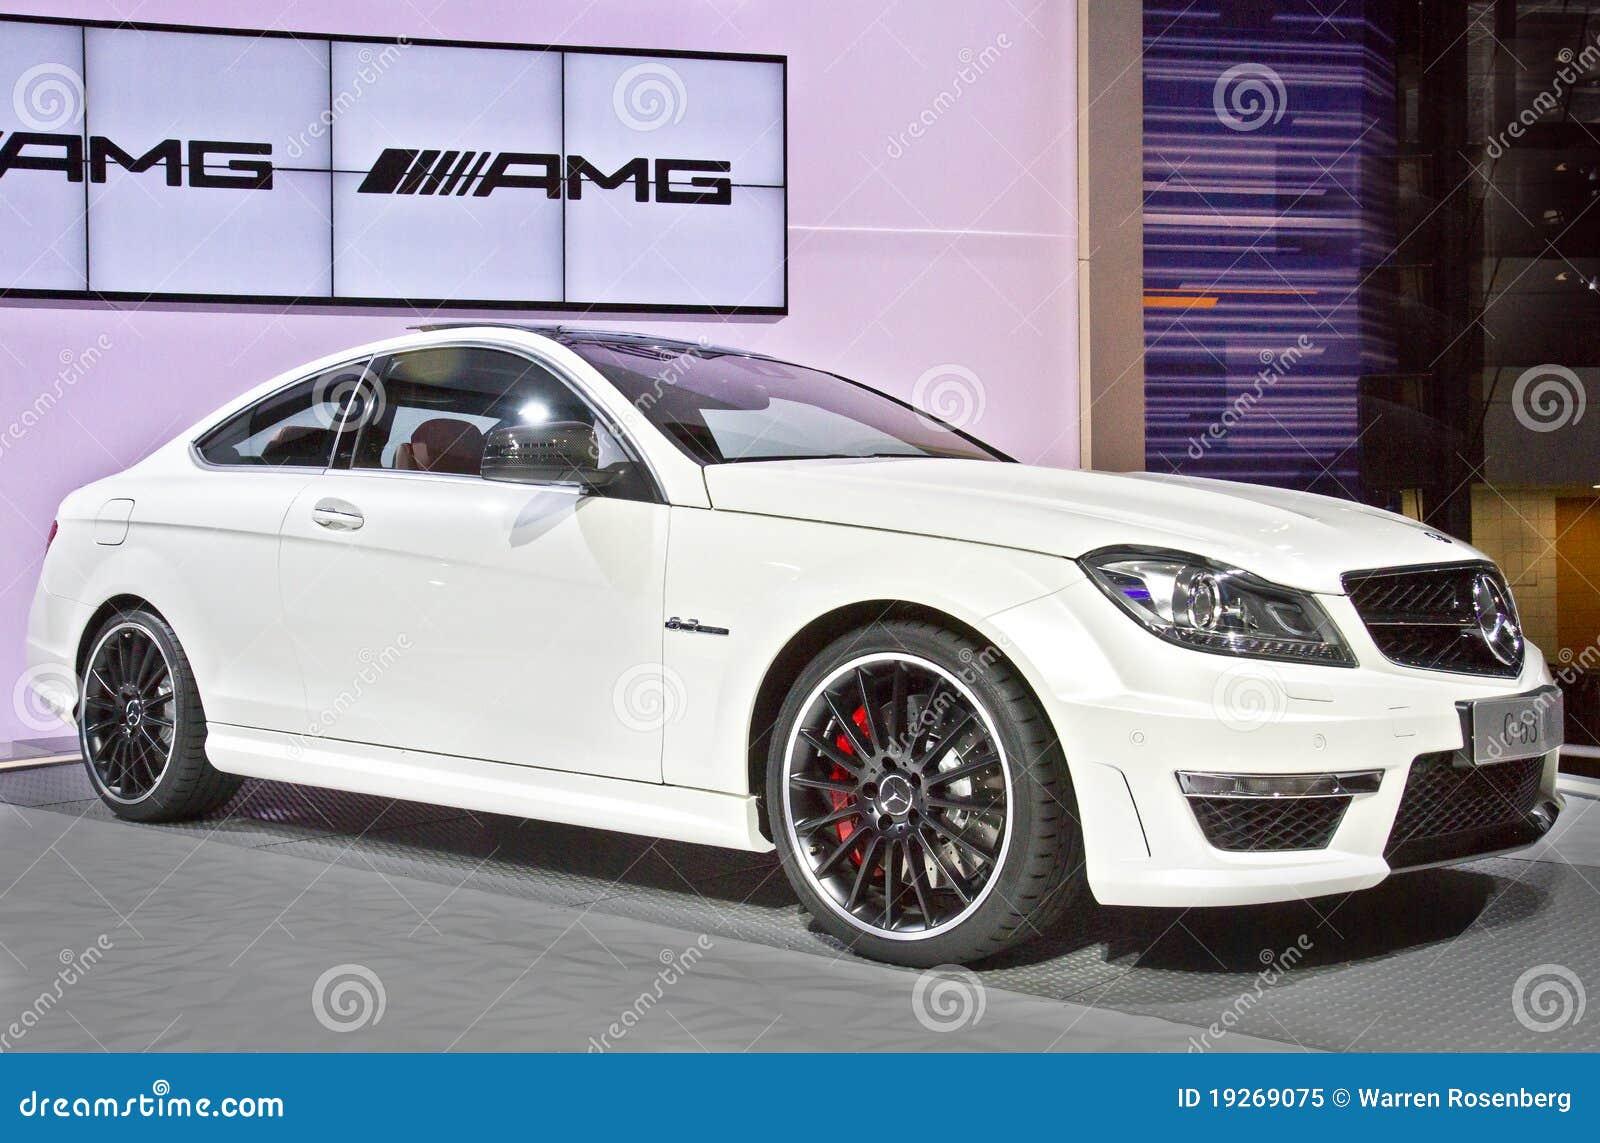 Benz c63 mercedes amg